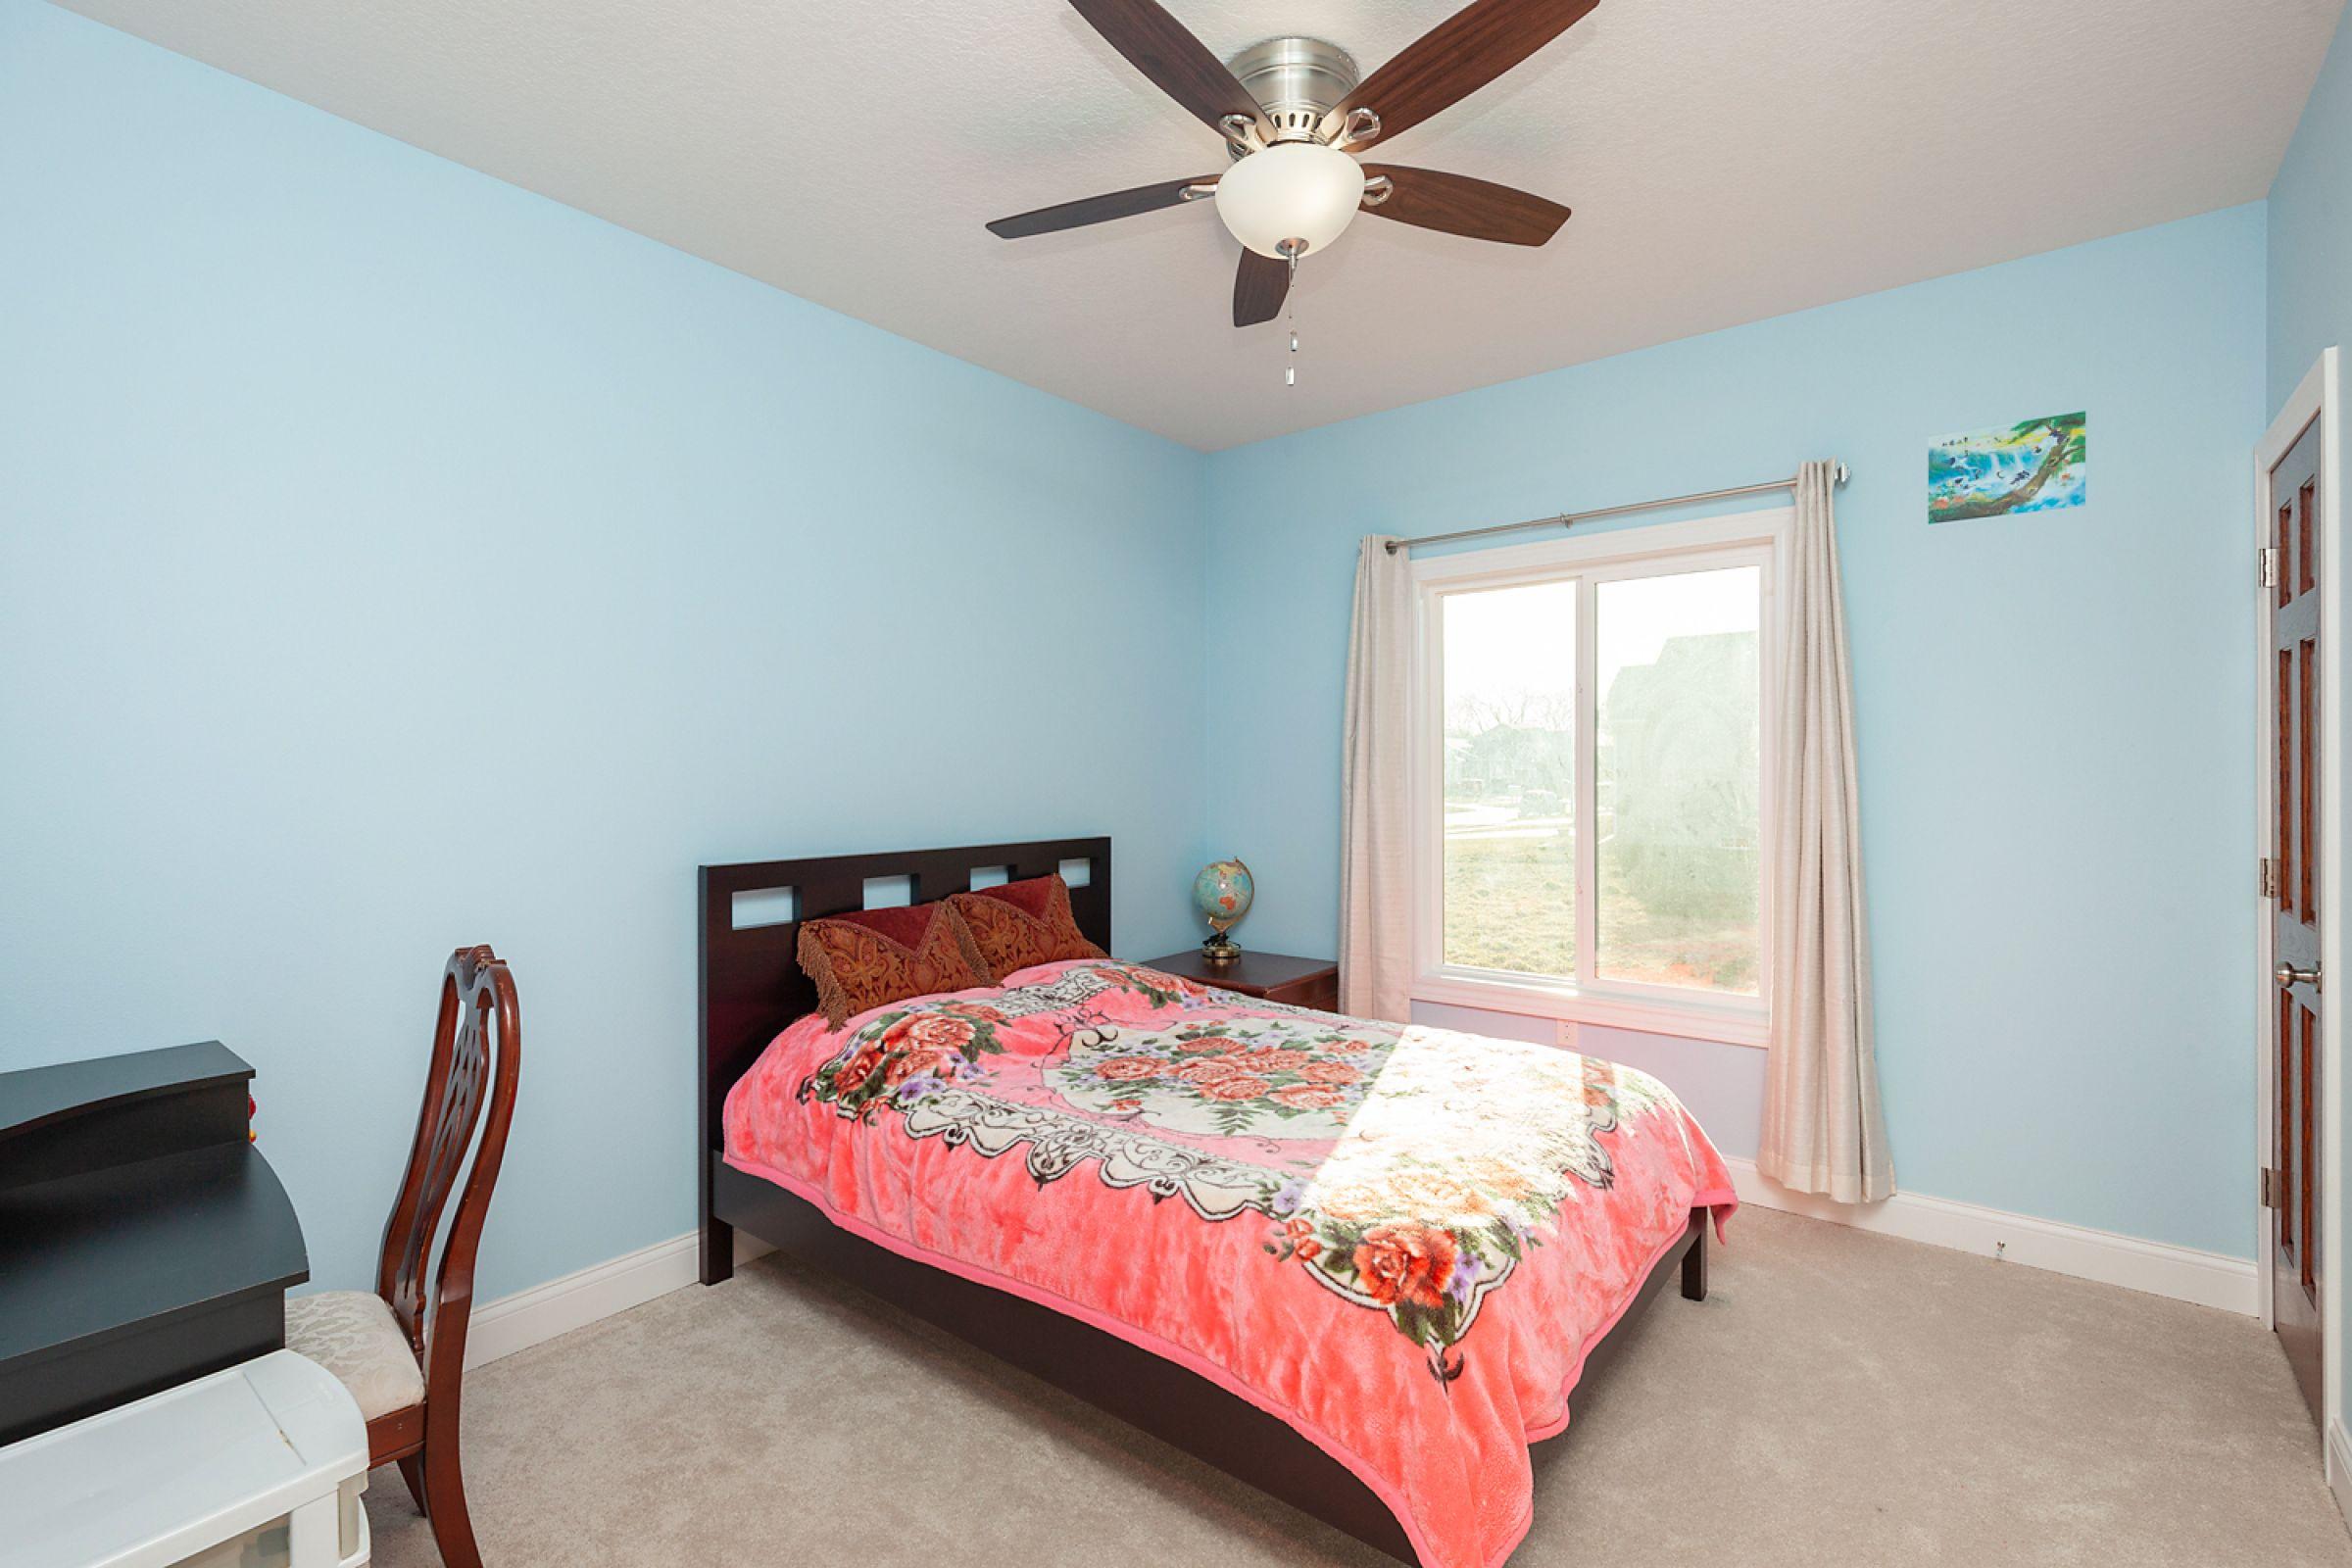 residential-polk-county-iowa-0-acres-listing-number-15403-2-2021-03-12-054200.jpg